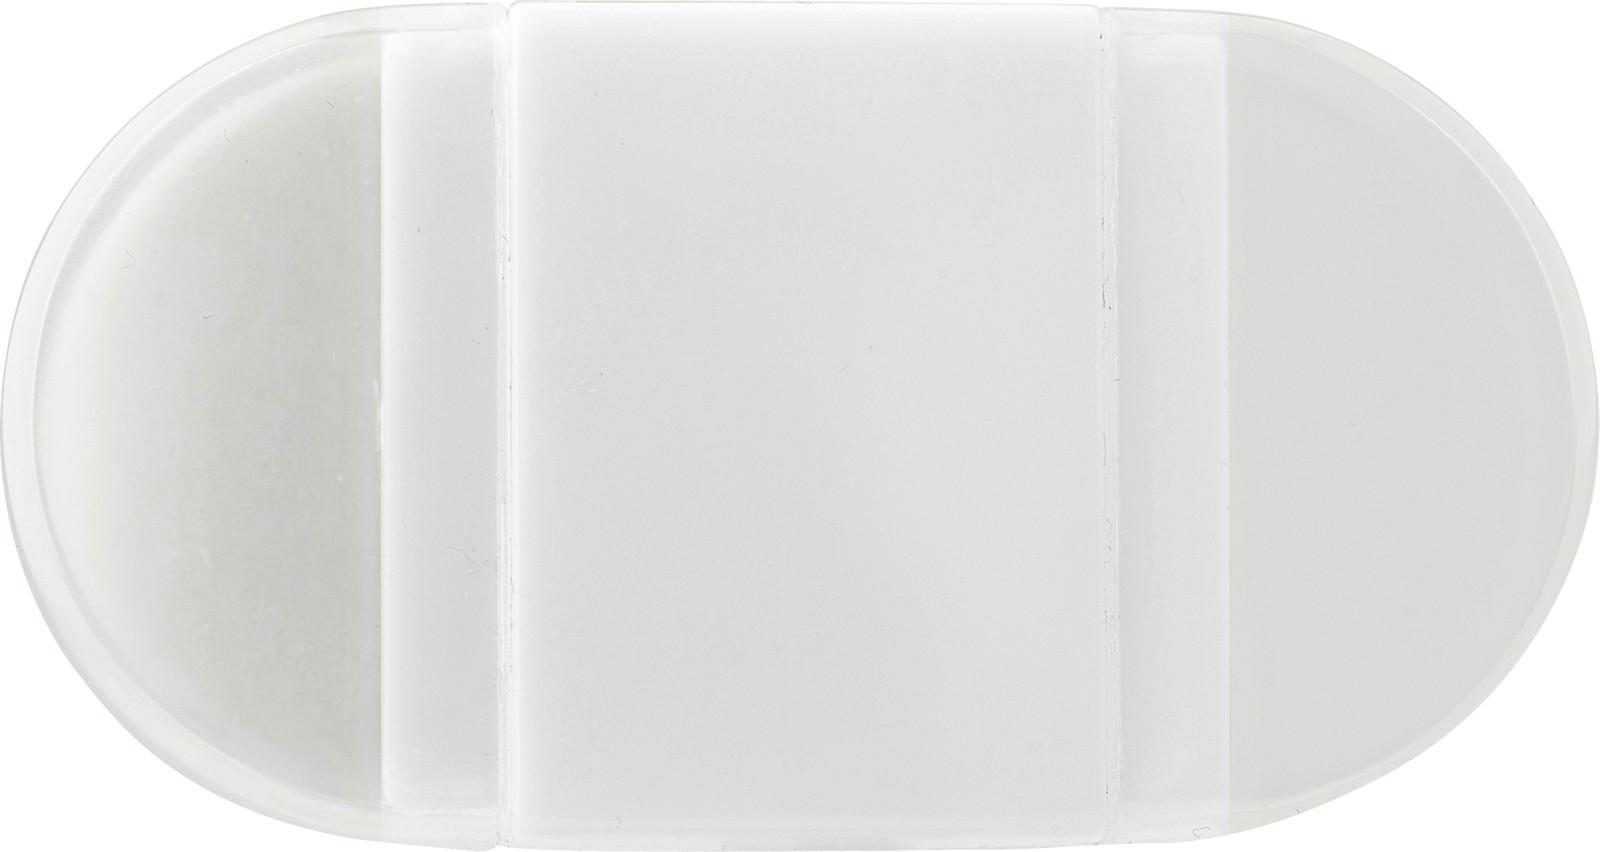 PS pencil sharpener and eraser - White